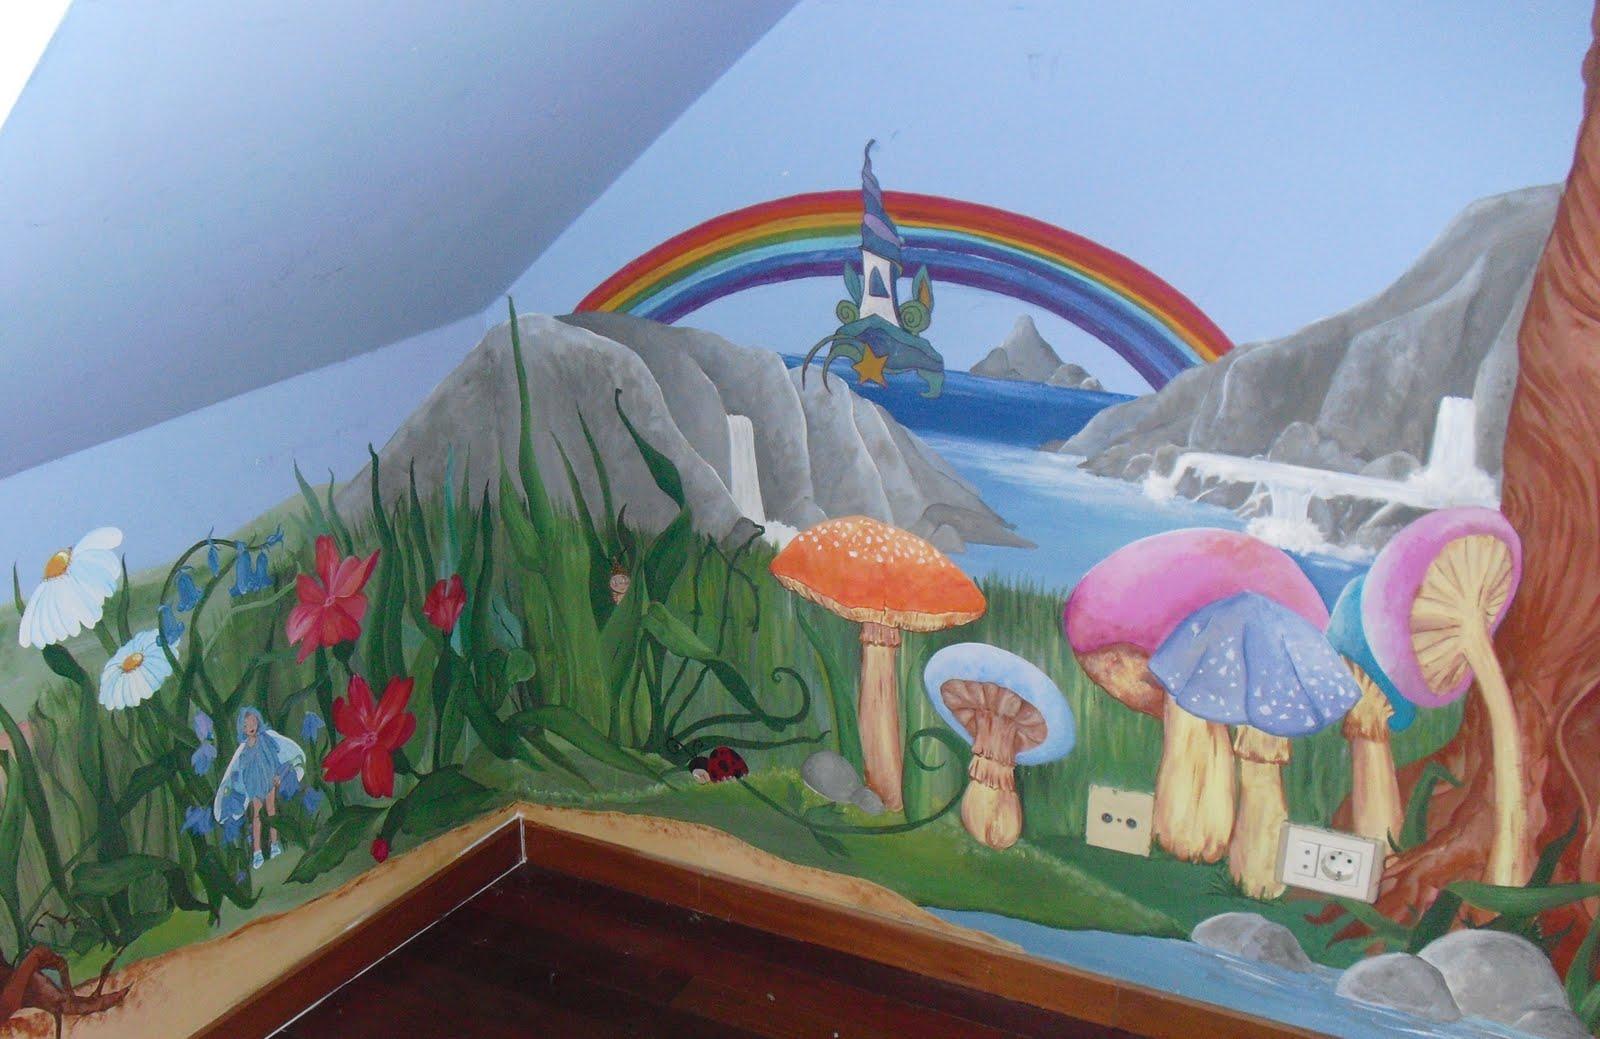 Artesan a y pintura decorativa mural para habitaci n infantil for Mural para habitacion